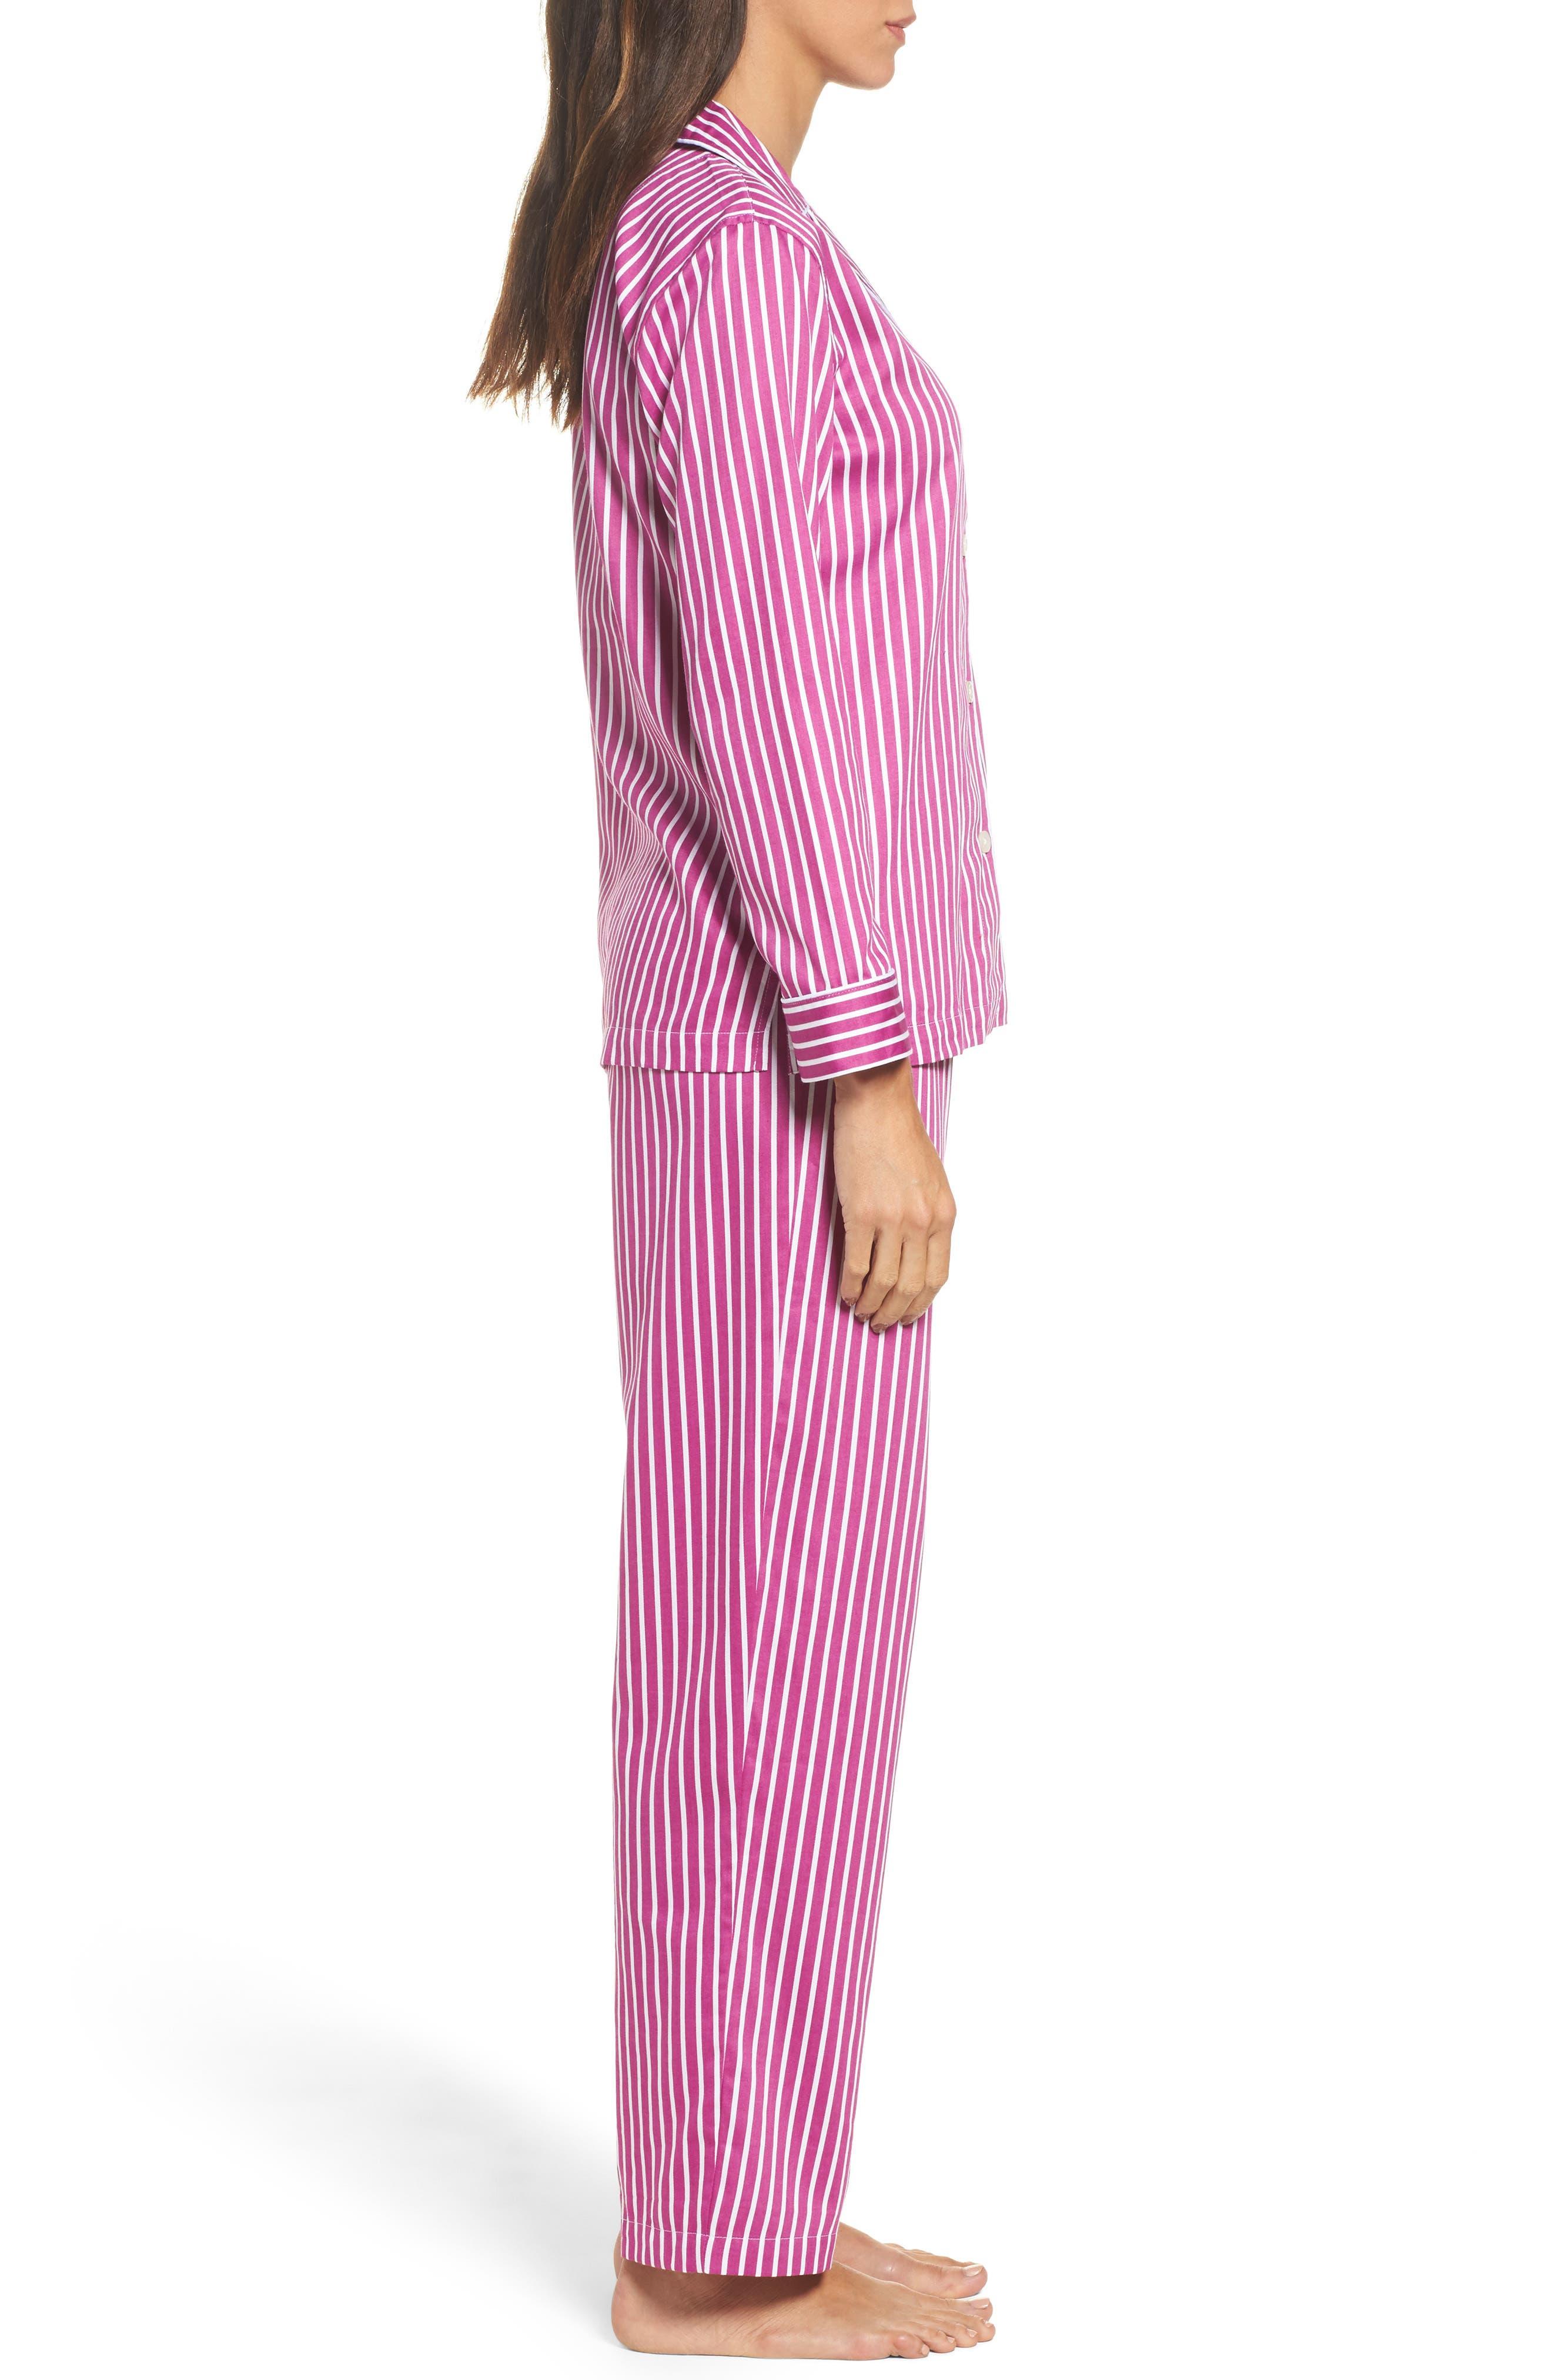 Notch Collar Pajamas,                             Alternate thumbnail 3, color,                             Pink/ White Stripe